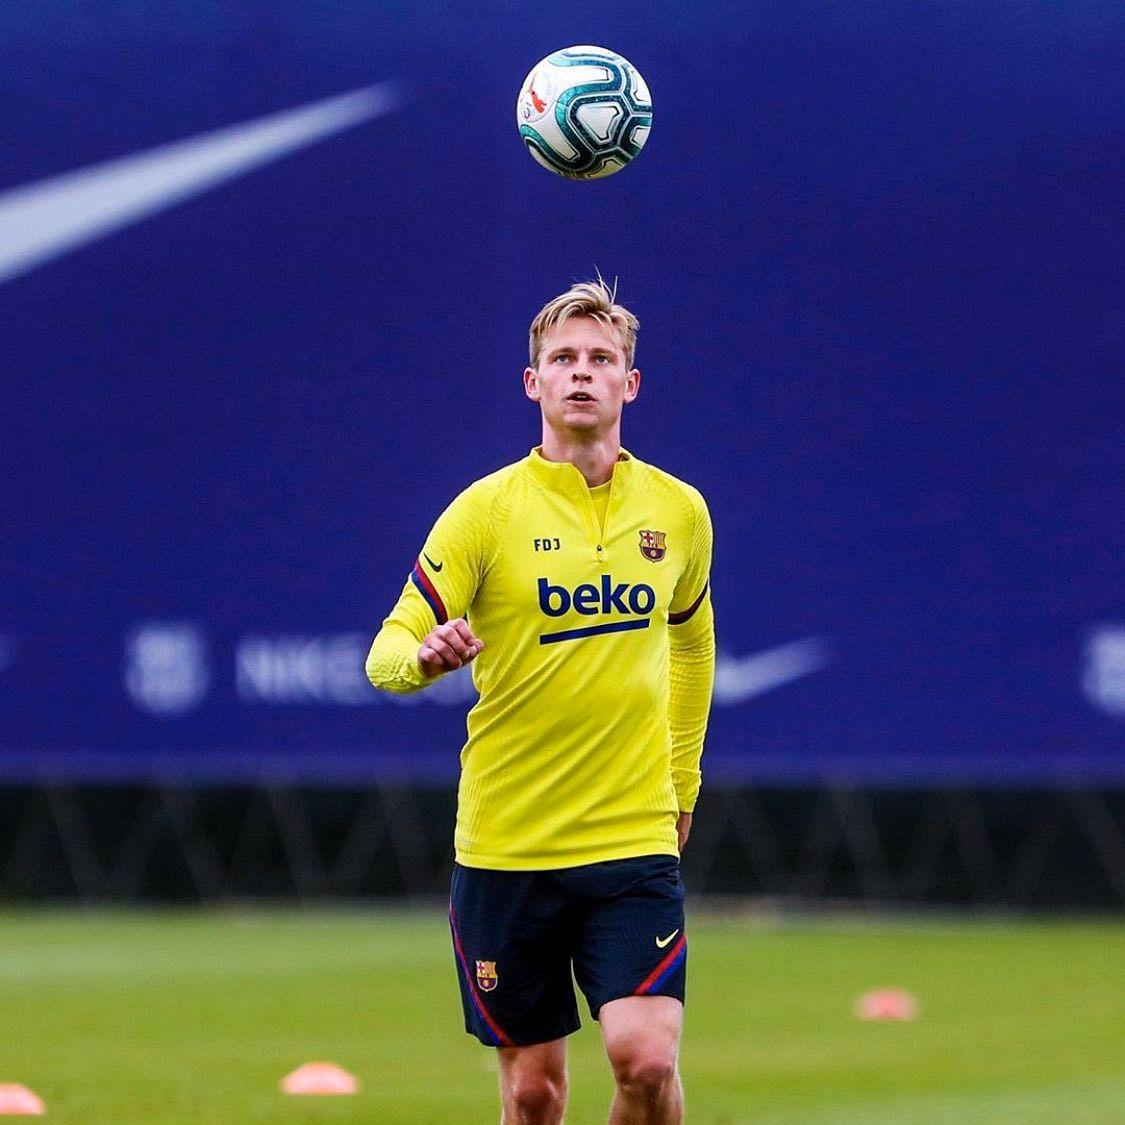 La Liga: Barcelona confirm Frenkie de Jong's injury; no return-date fixed for the Dutchman